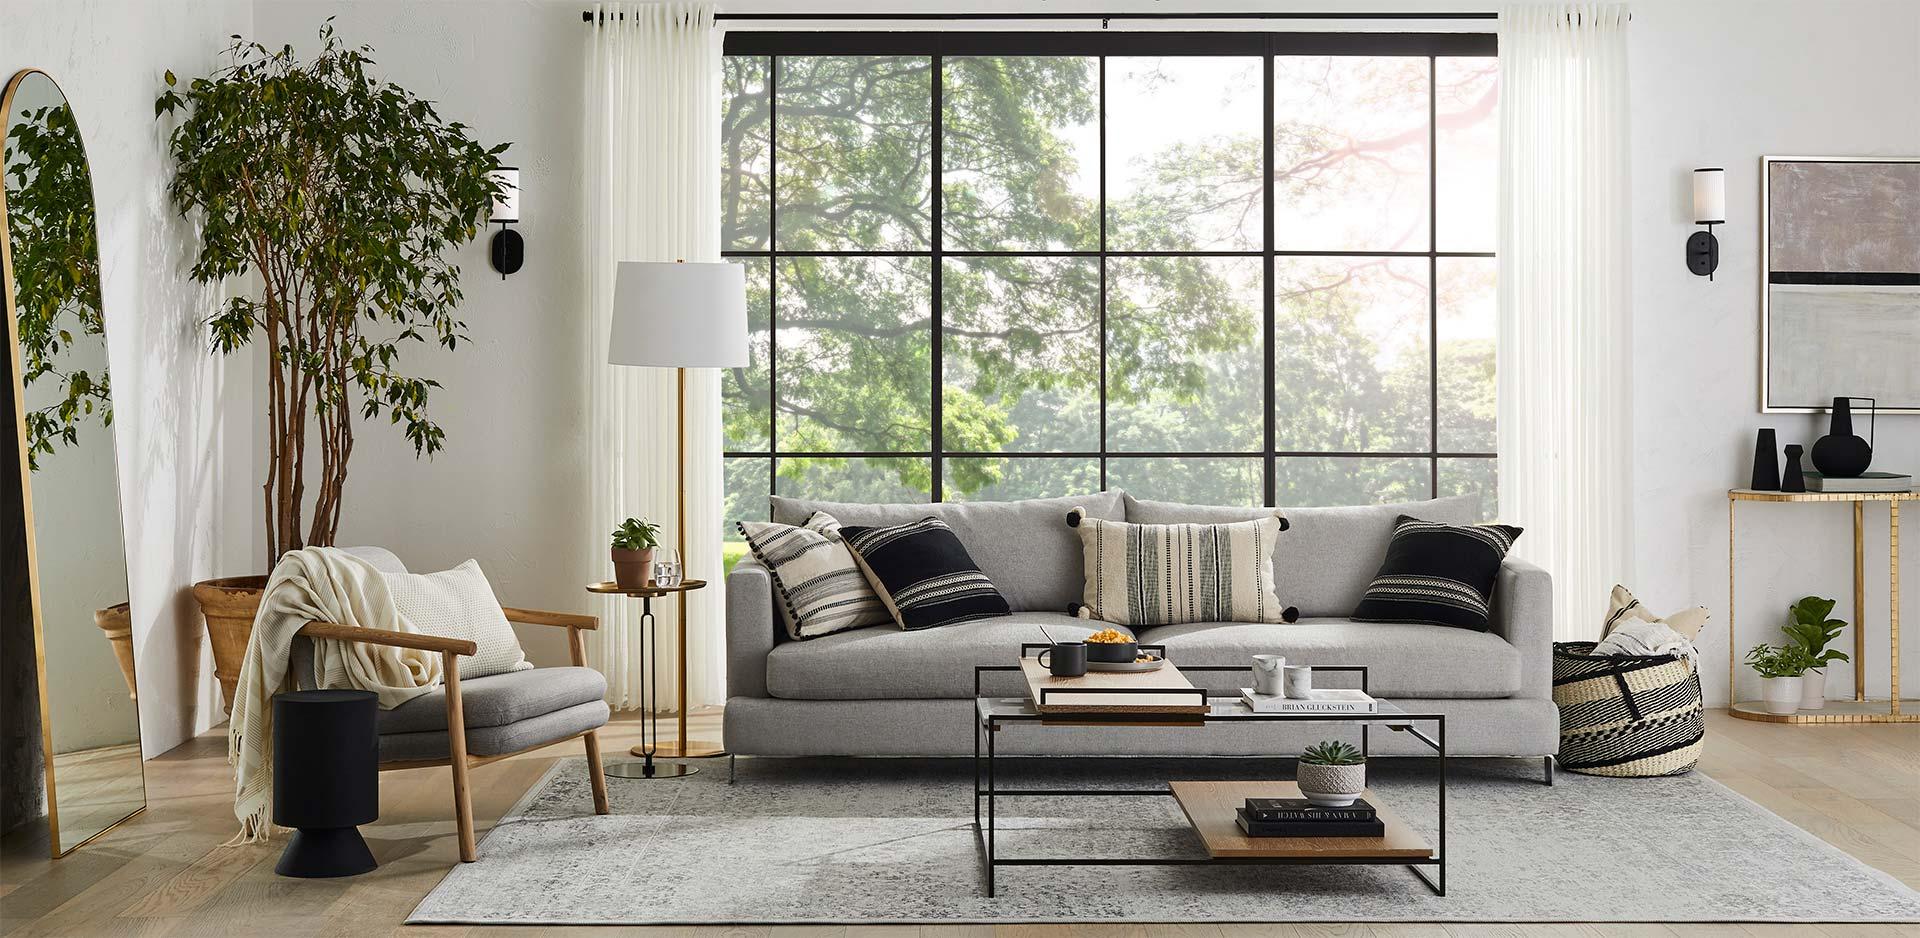 GlucksteinHome | Furniture | The Hoxton Sofa